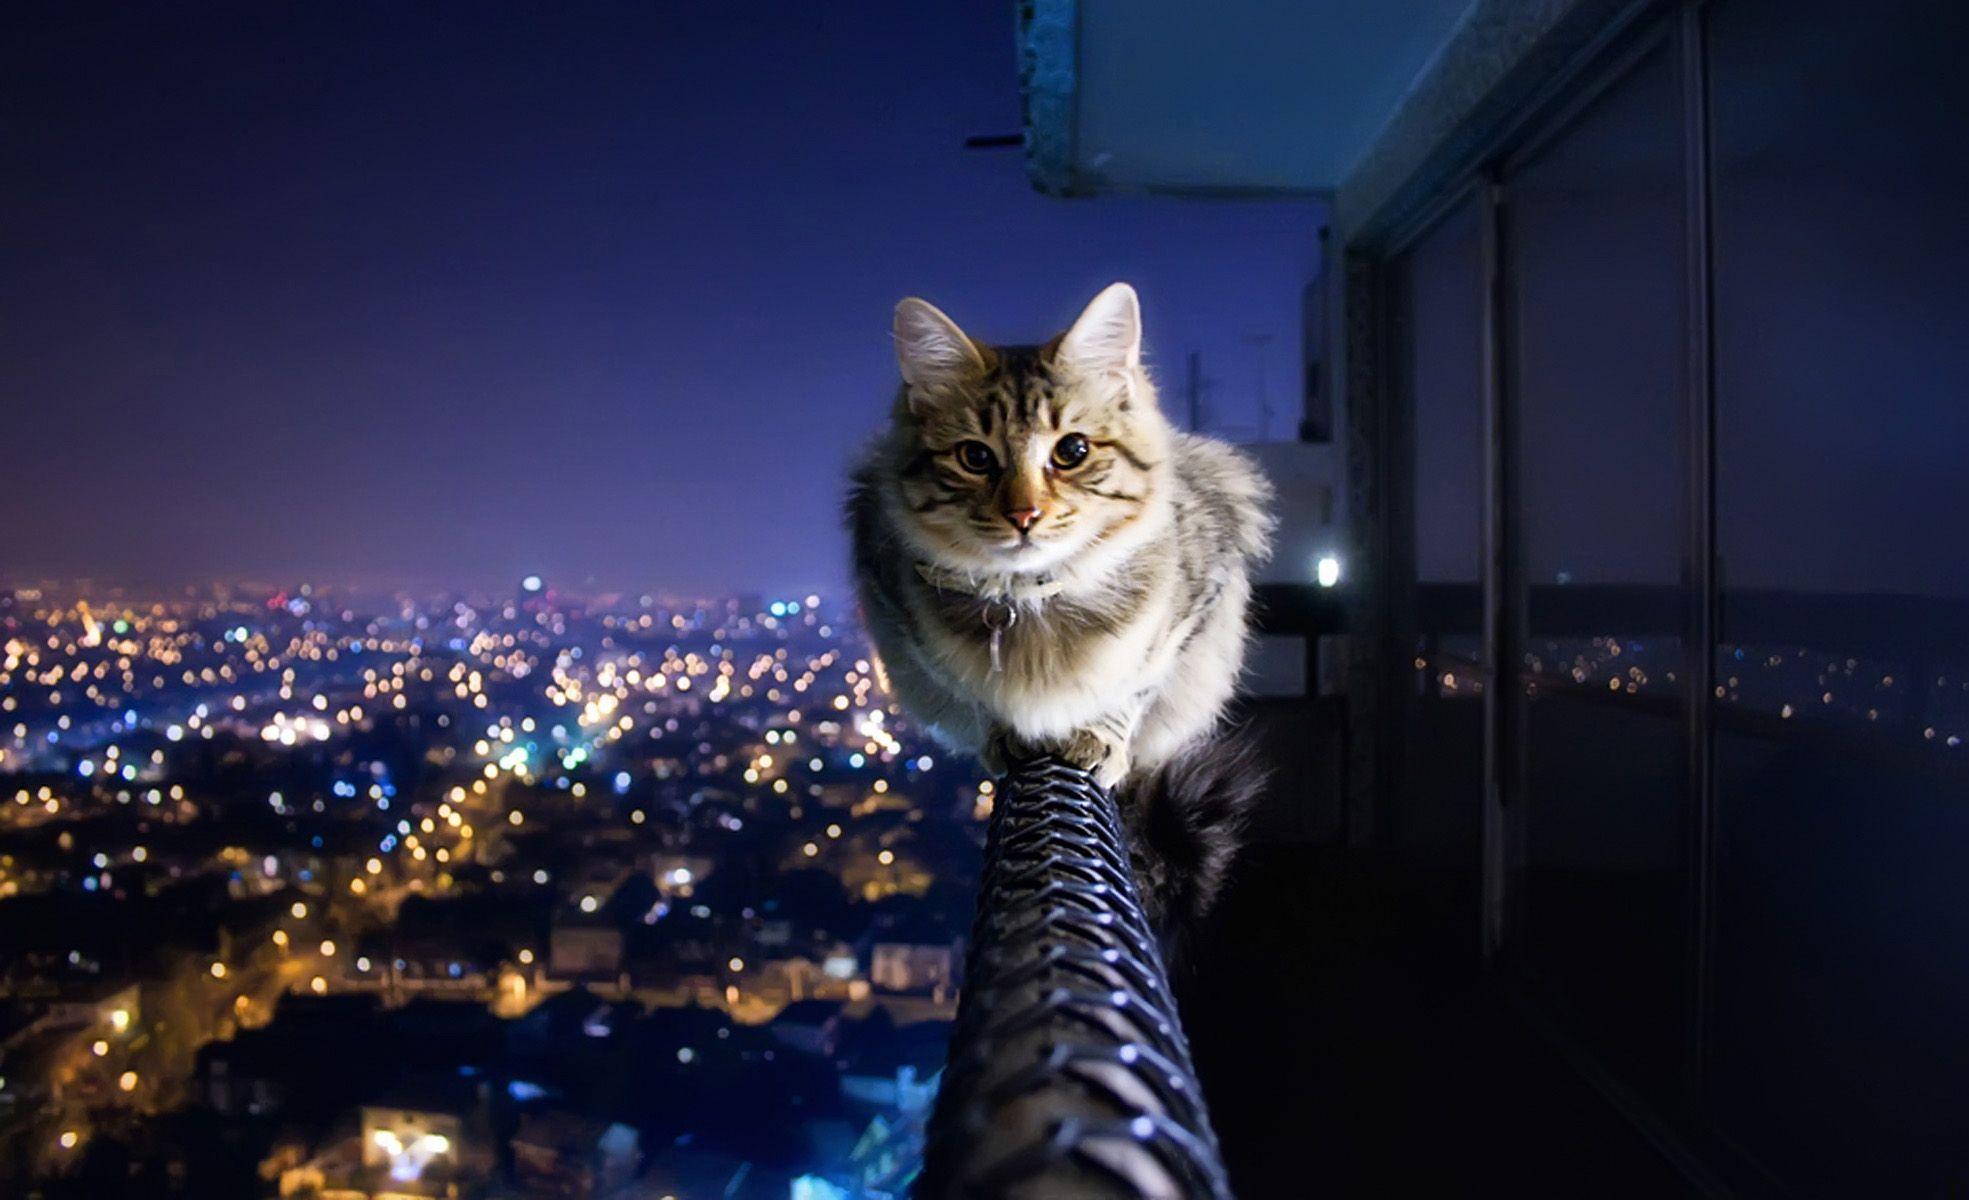 Wonderful Wallpaper Animal Night - 1e1f0559d8d44394e45ee1e5d76621b5  Best Photo Reference_341329      .jpg